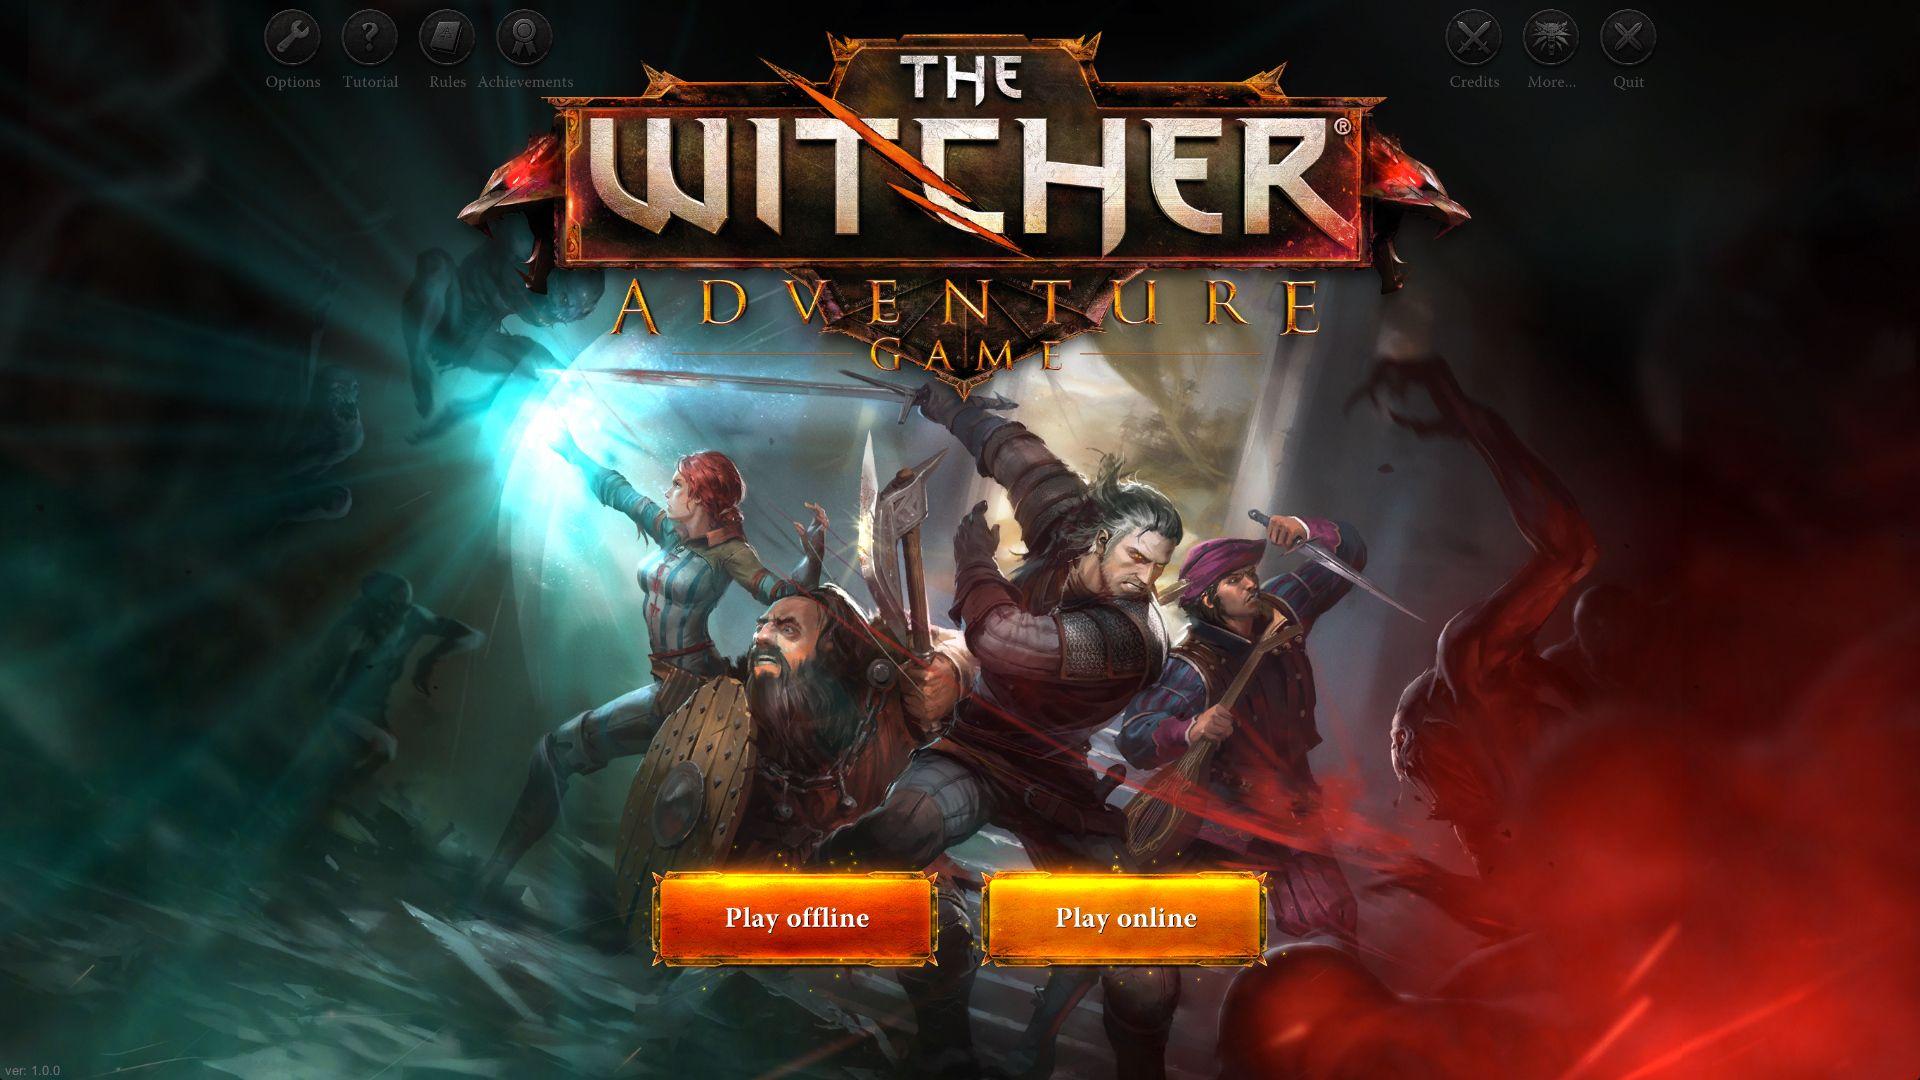 Witcher 3 Wallpapers Widescreen « Firefox Wallpaper « Free